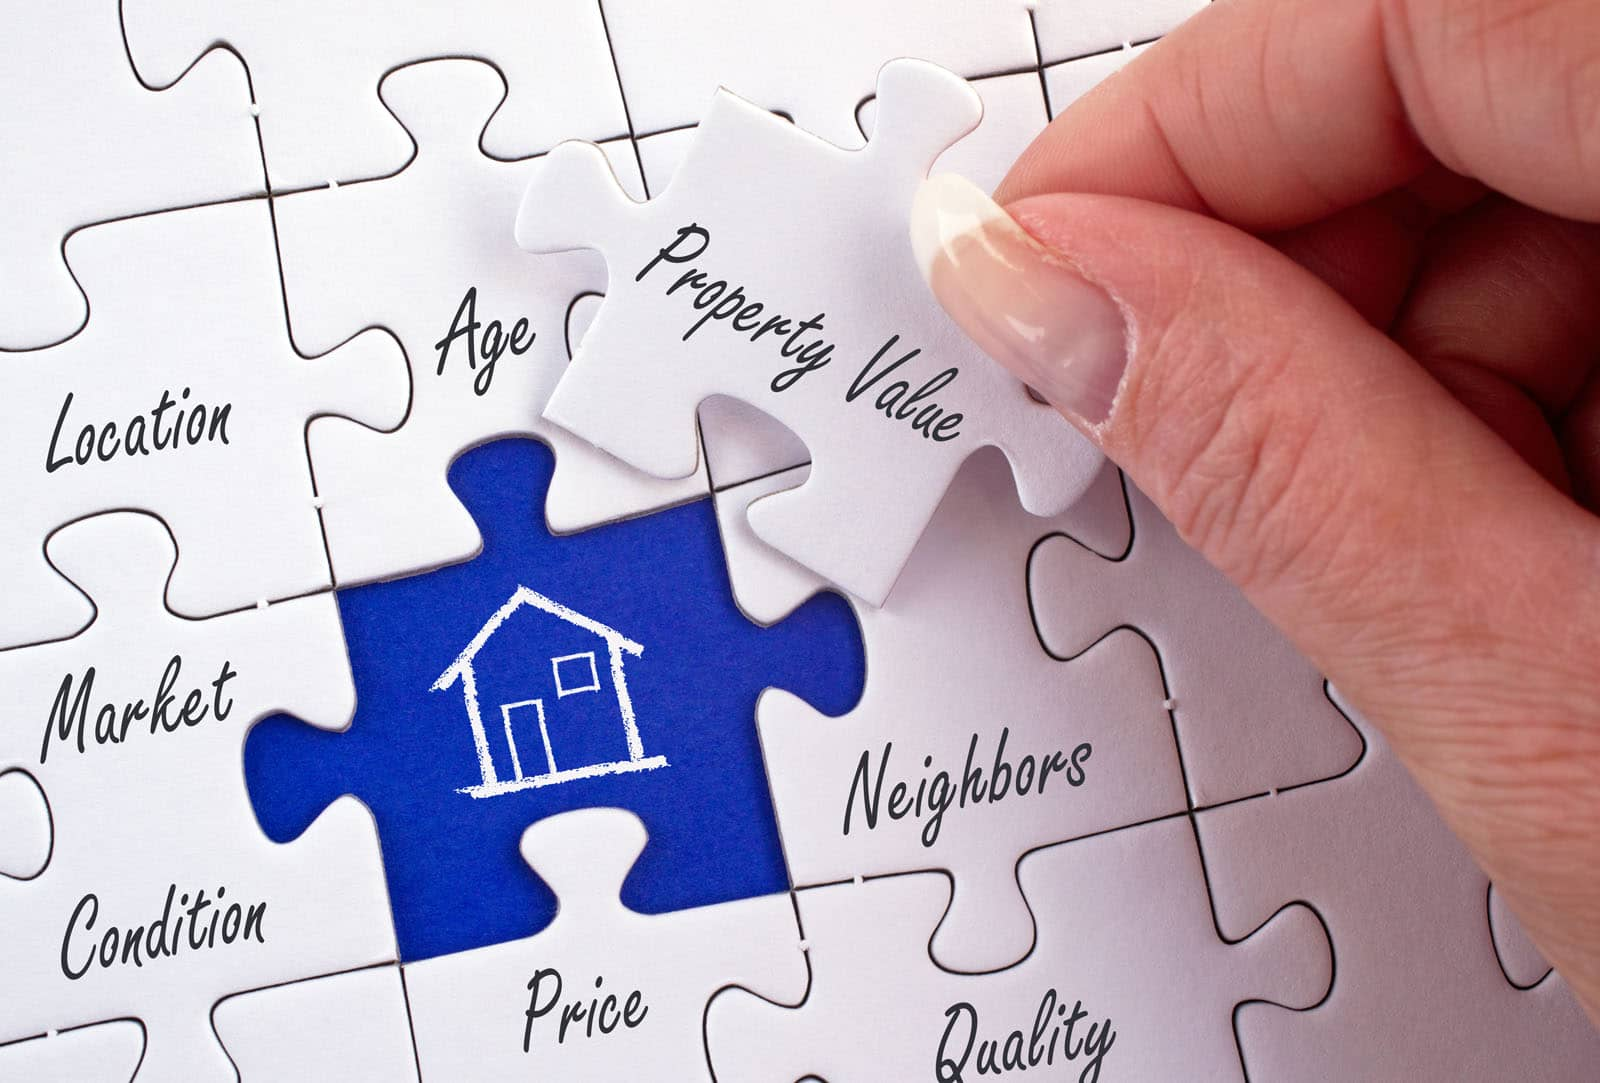 Checklist to Prepare for Home Appraisal